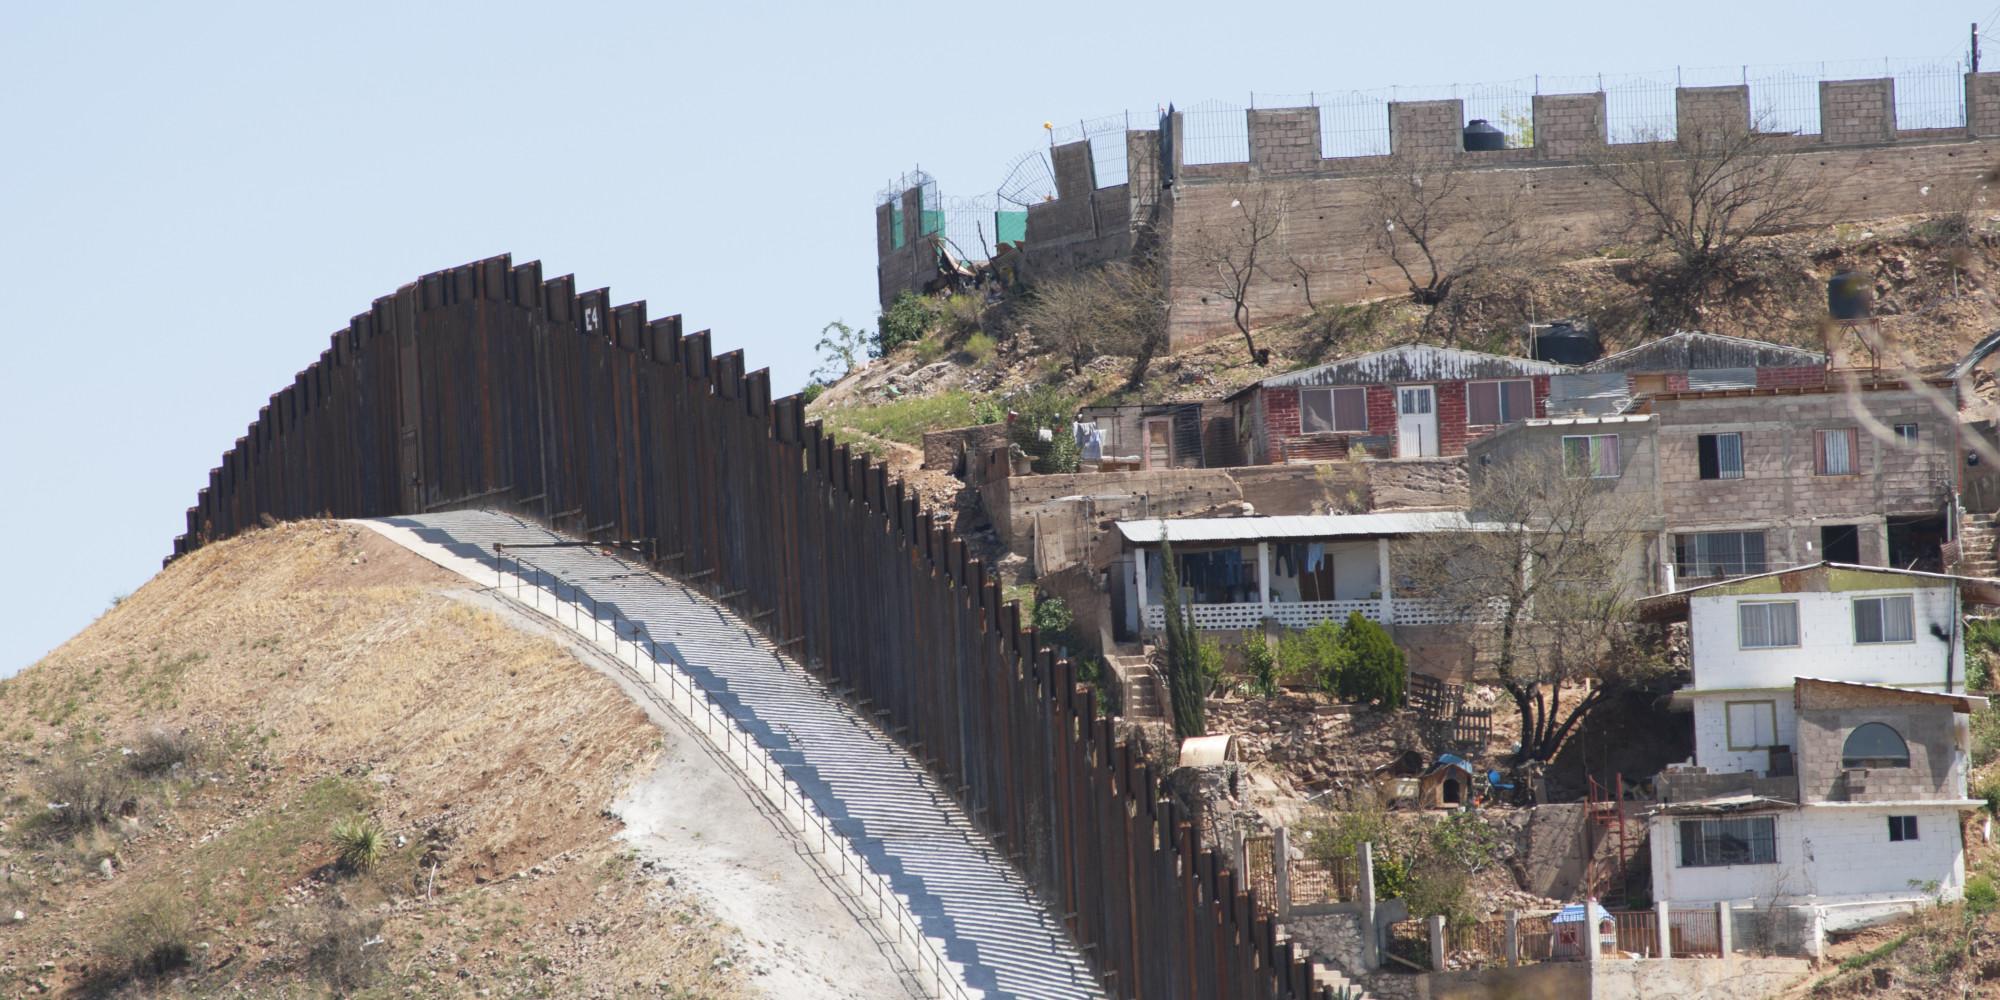 US Militarization of Border Isn't New